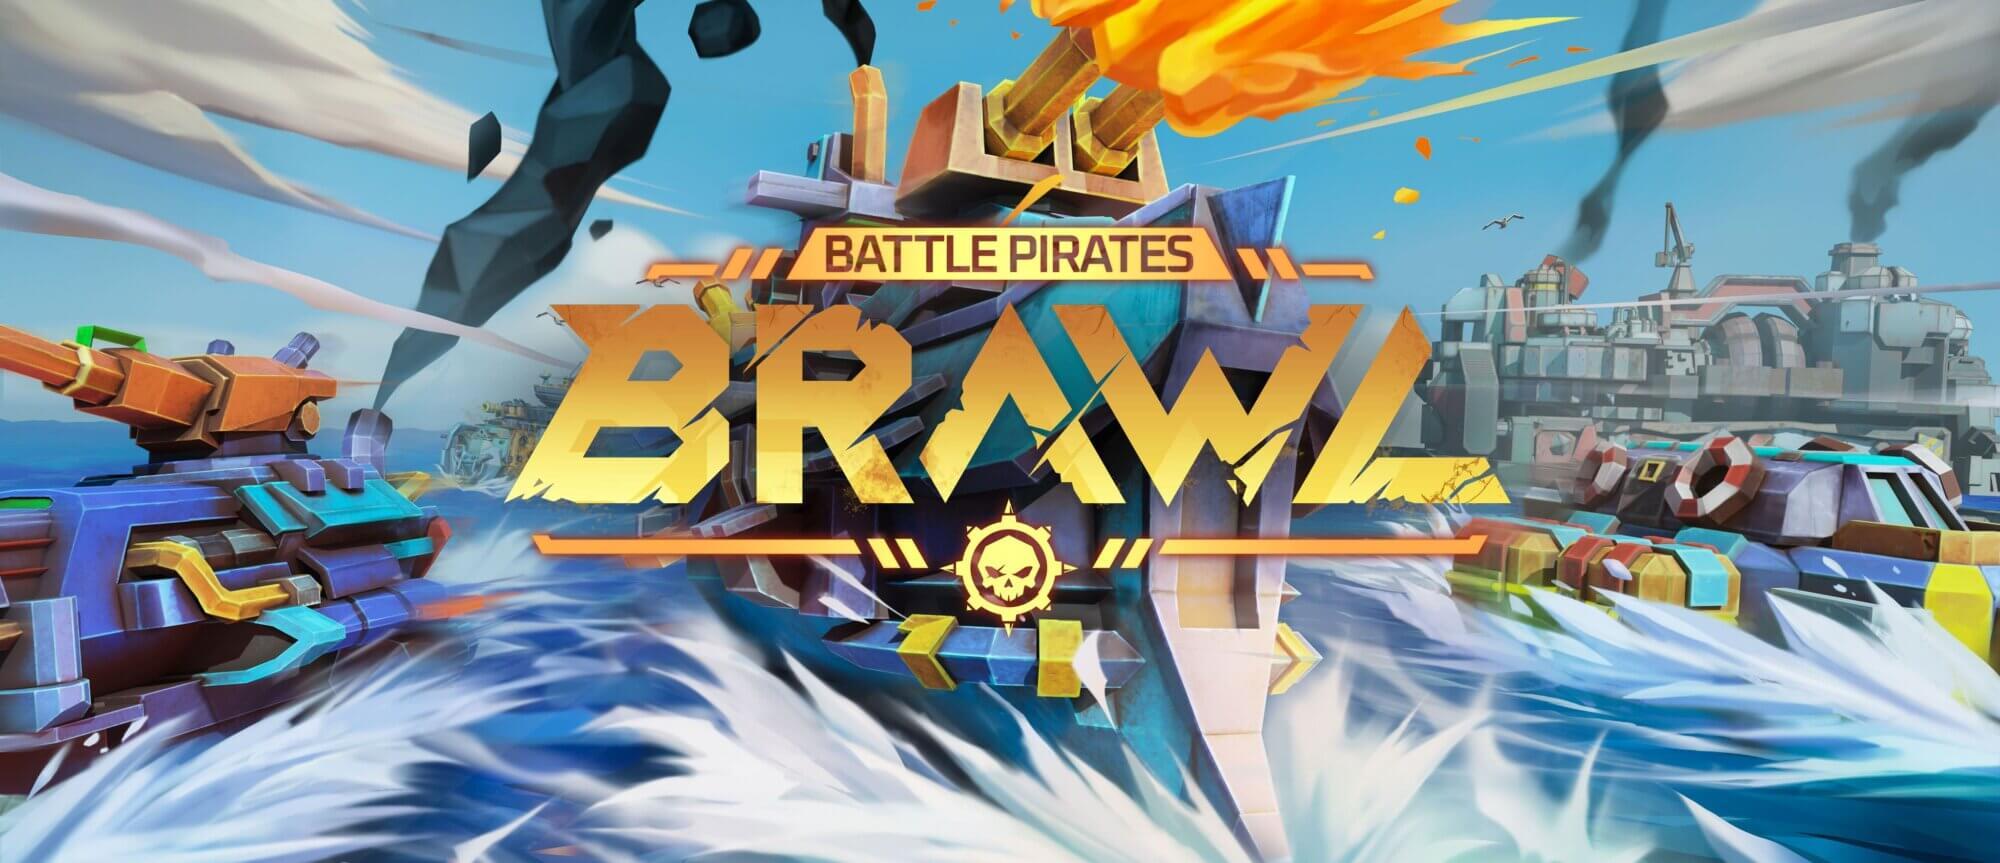 Battle Pirates Brawl